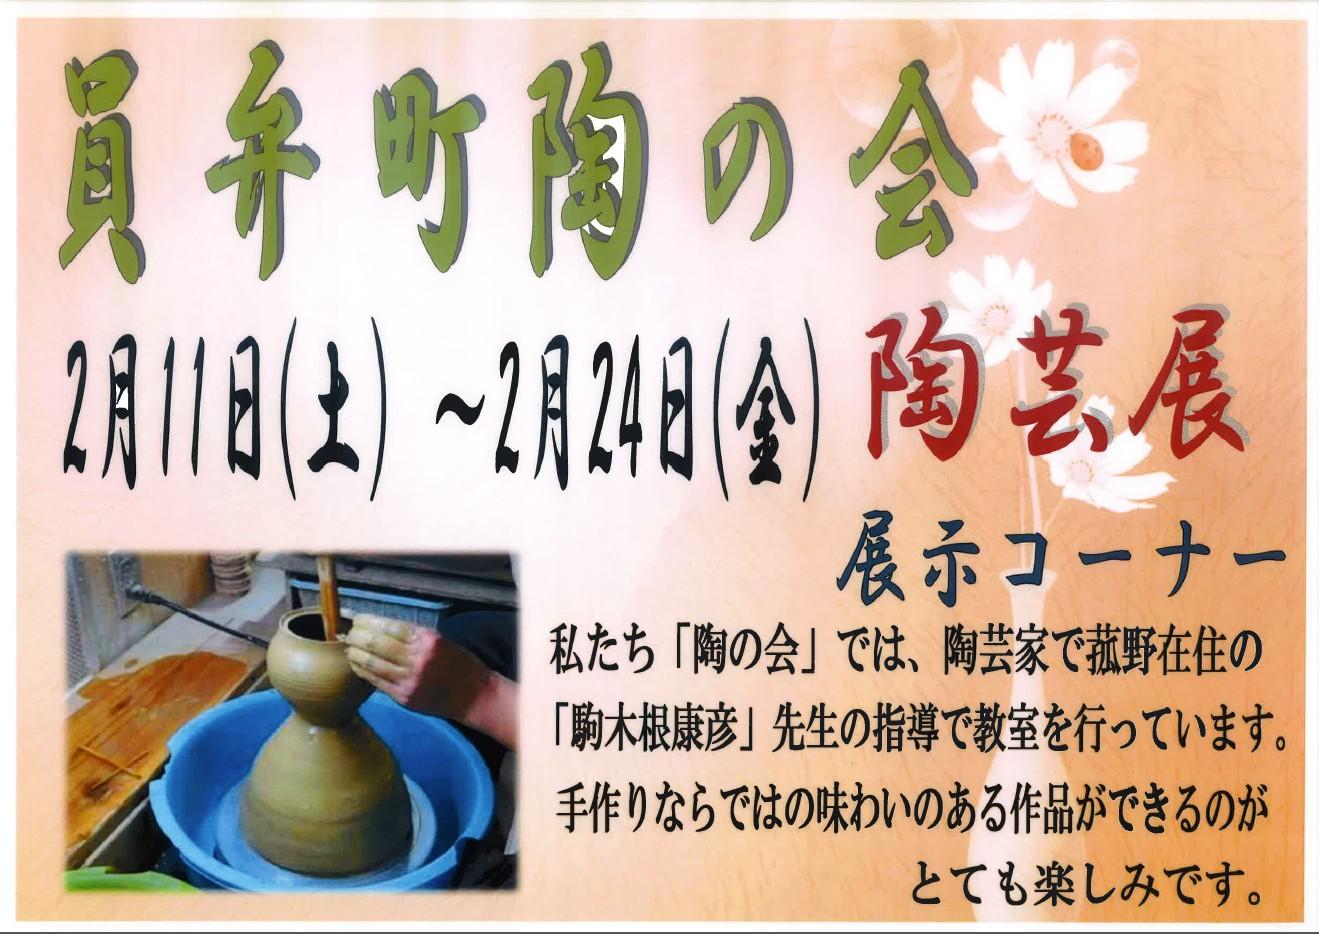 http://www.ajisainosato.com/info/images/2017y02m13d_093236331.jpg